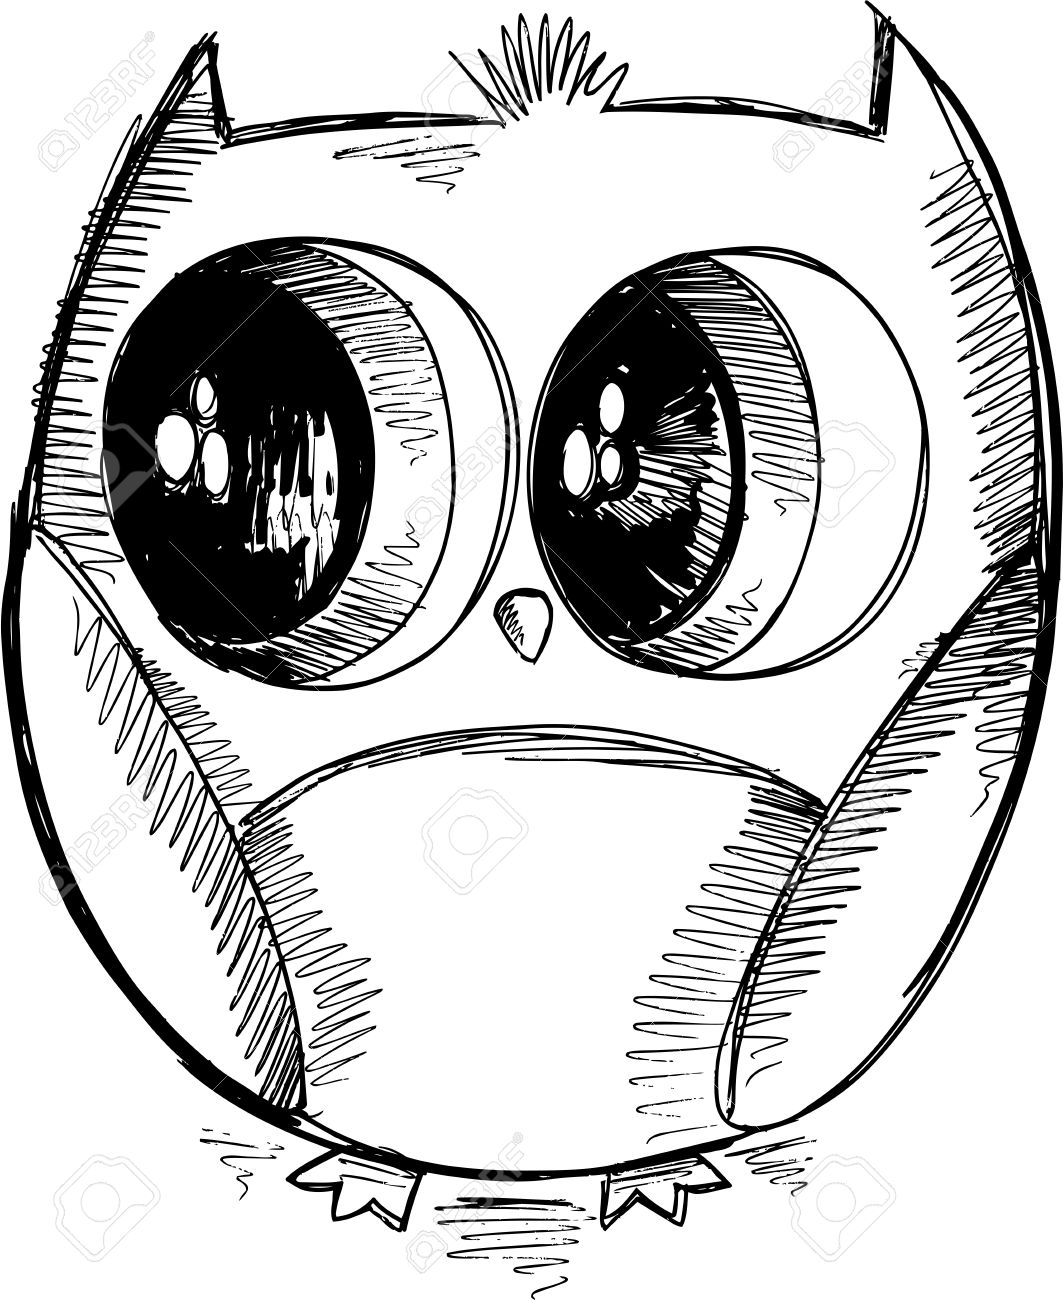 Cute Owl Sketch Doodle Vector Royalty Free Cliparts, Vectors, And ...